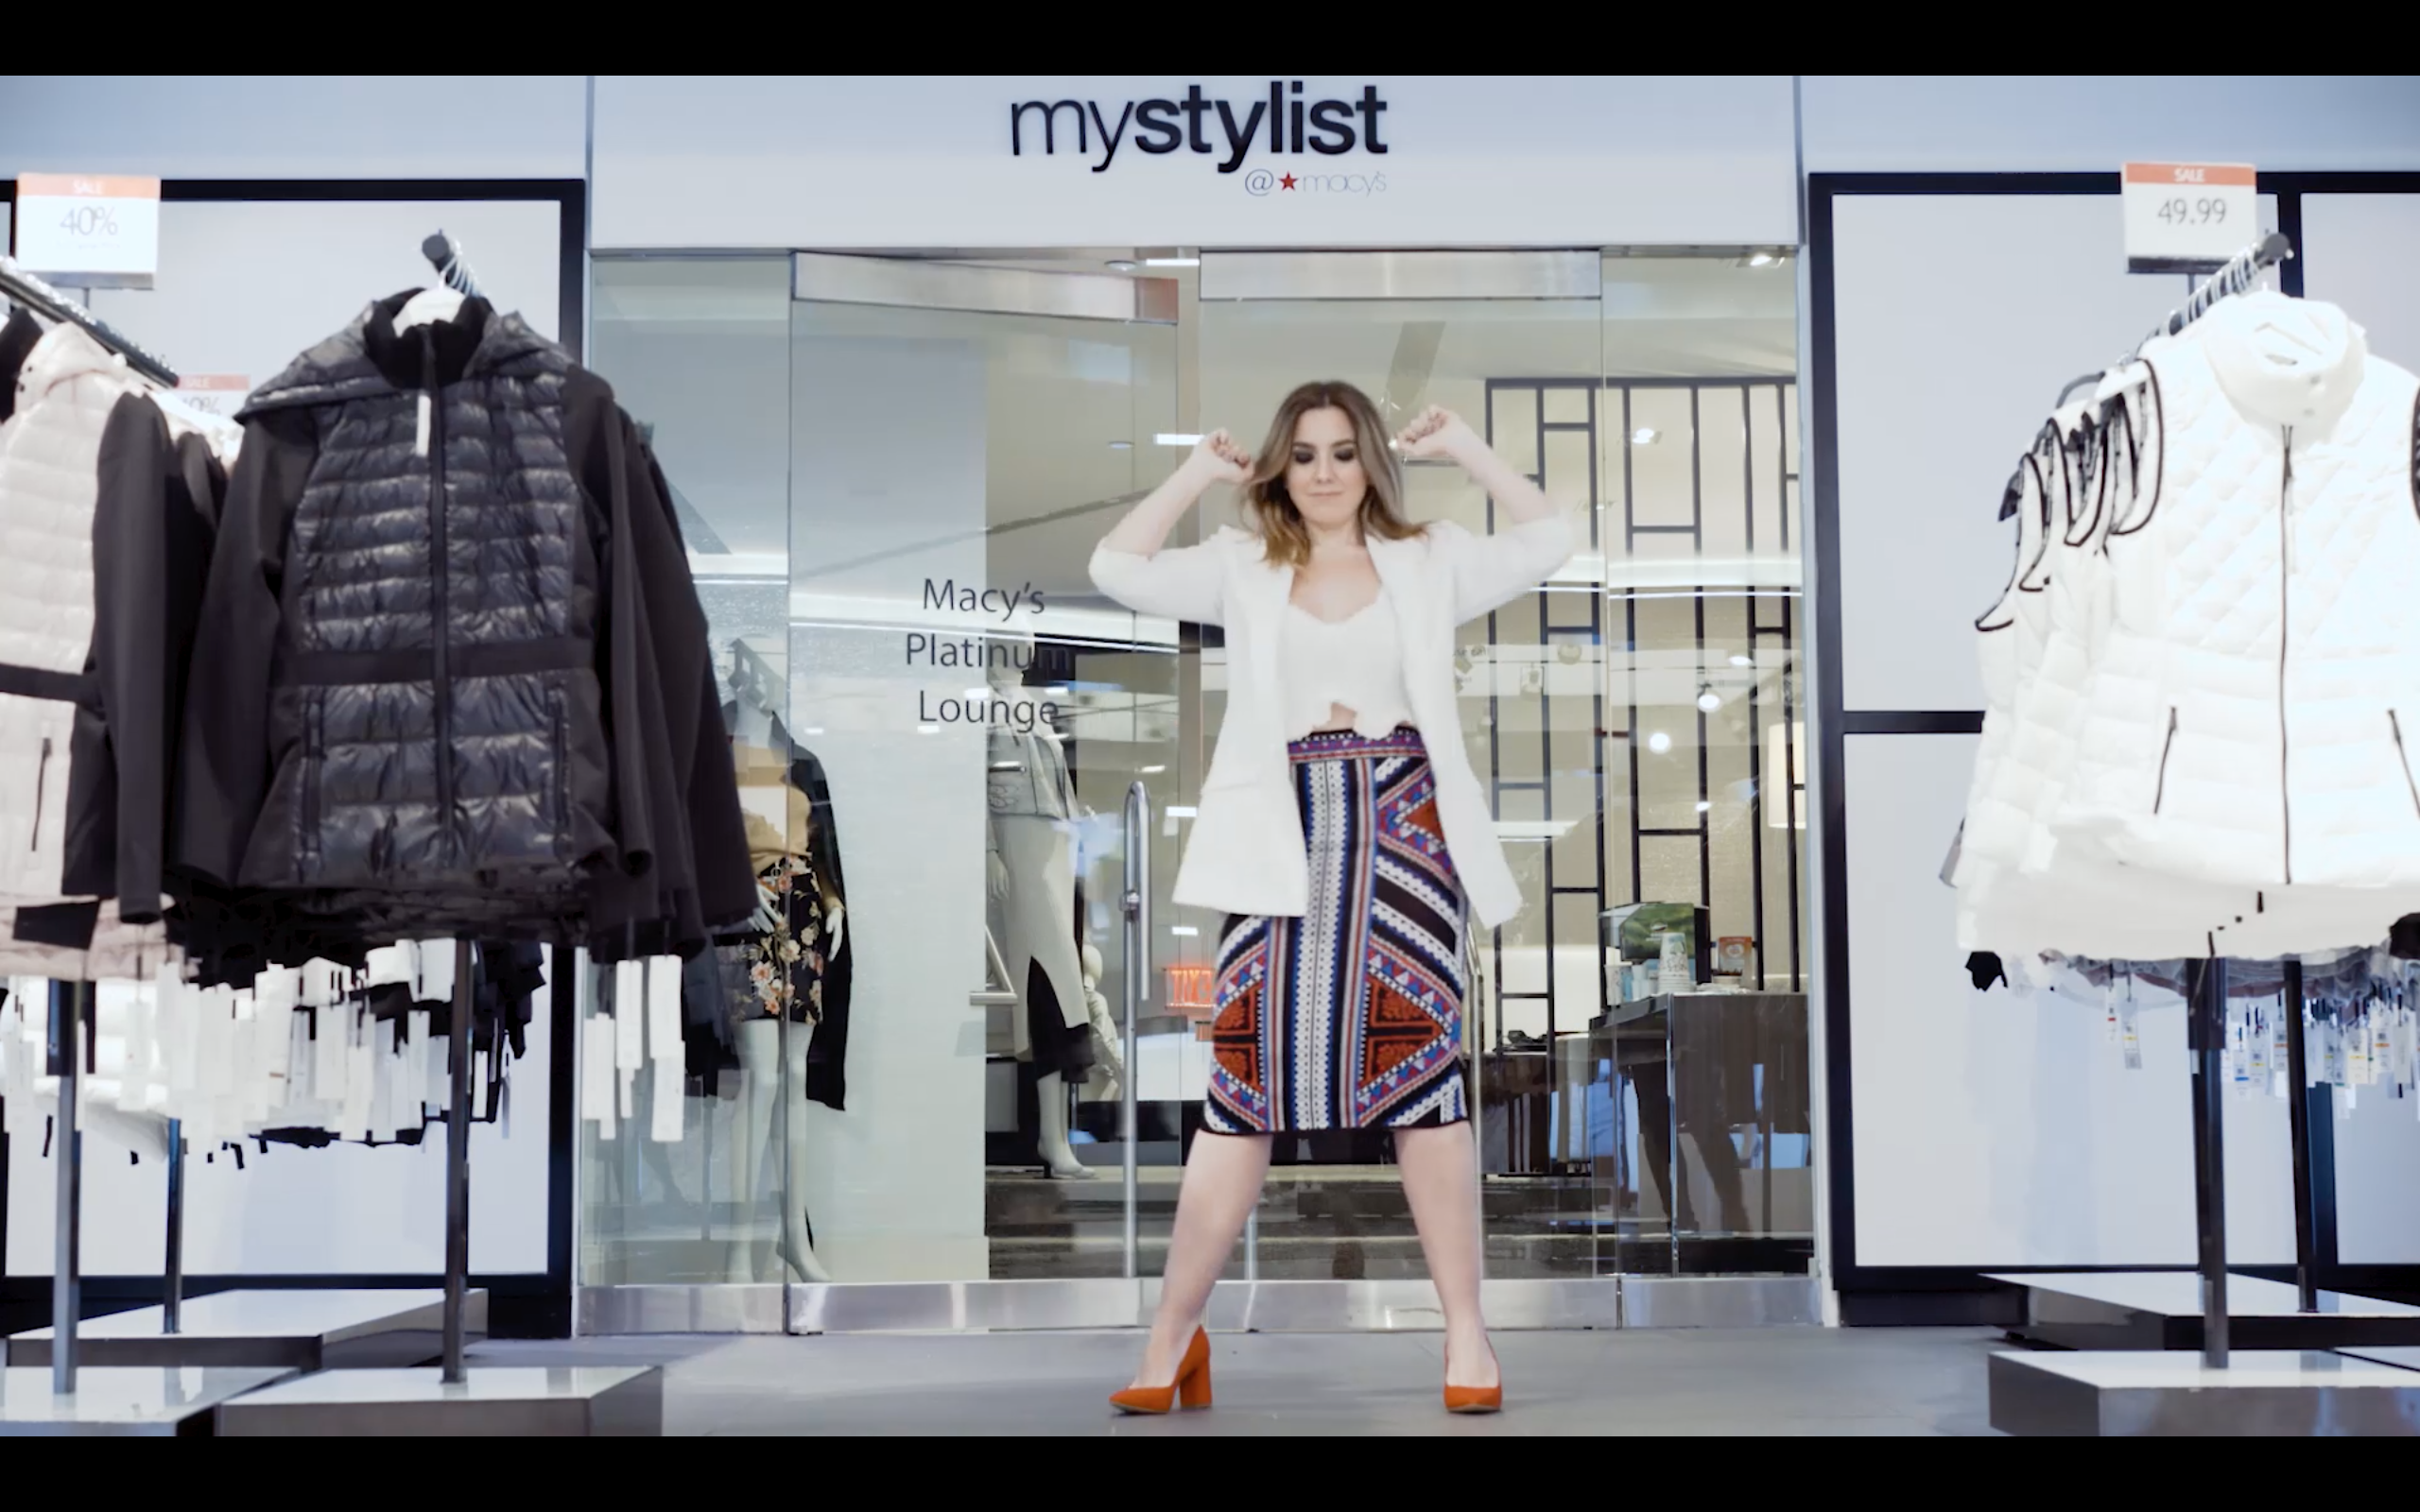 MY STYLIST: Asesoramiento personalizado en MACY'S